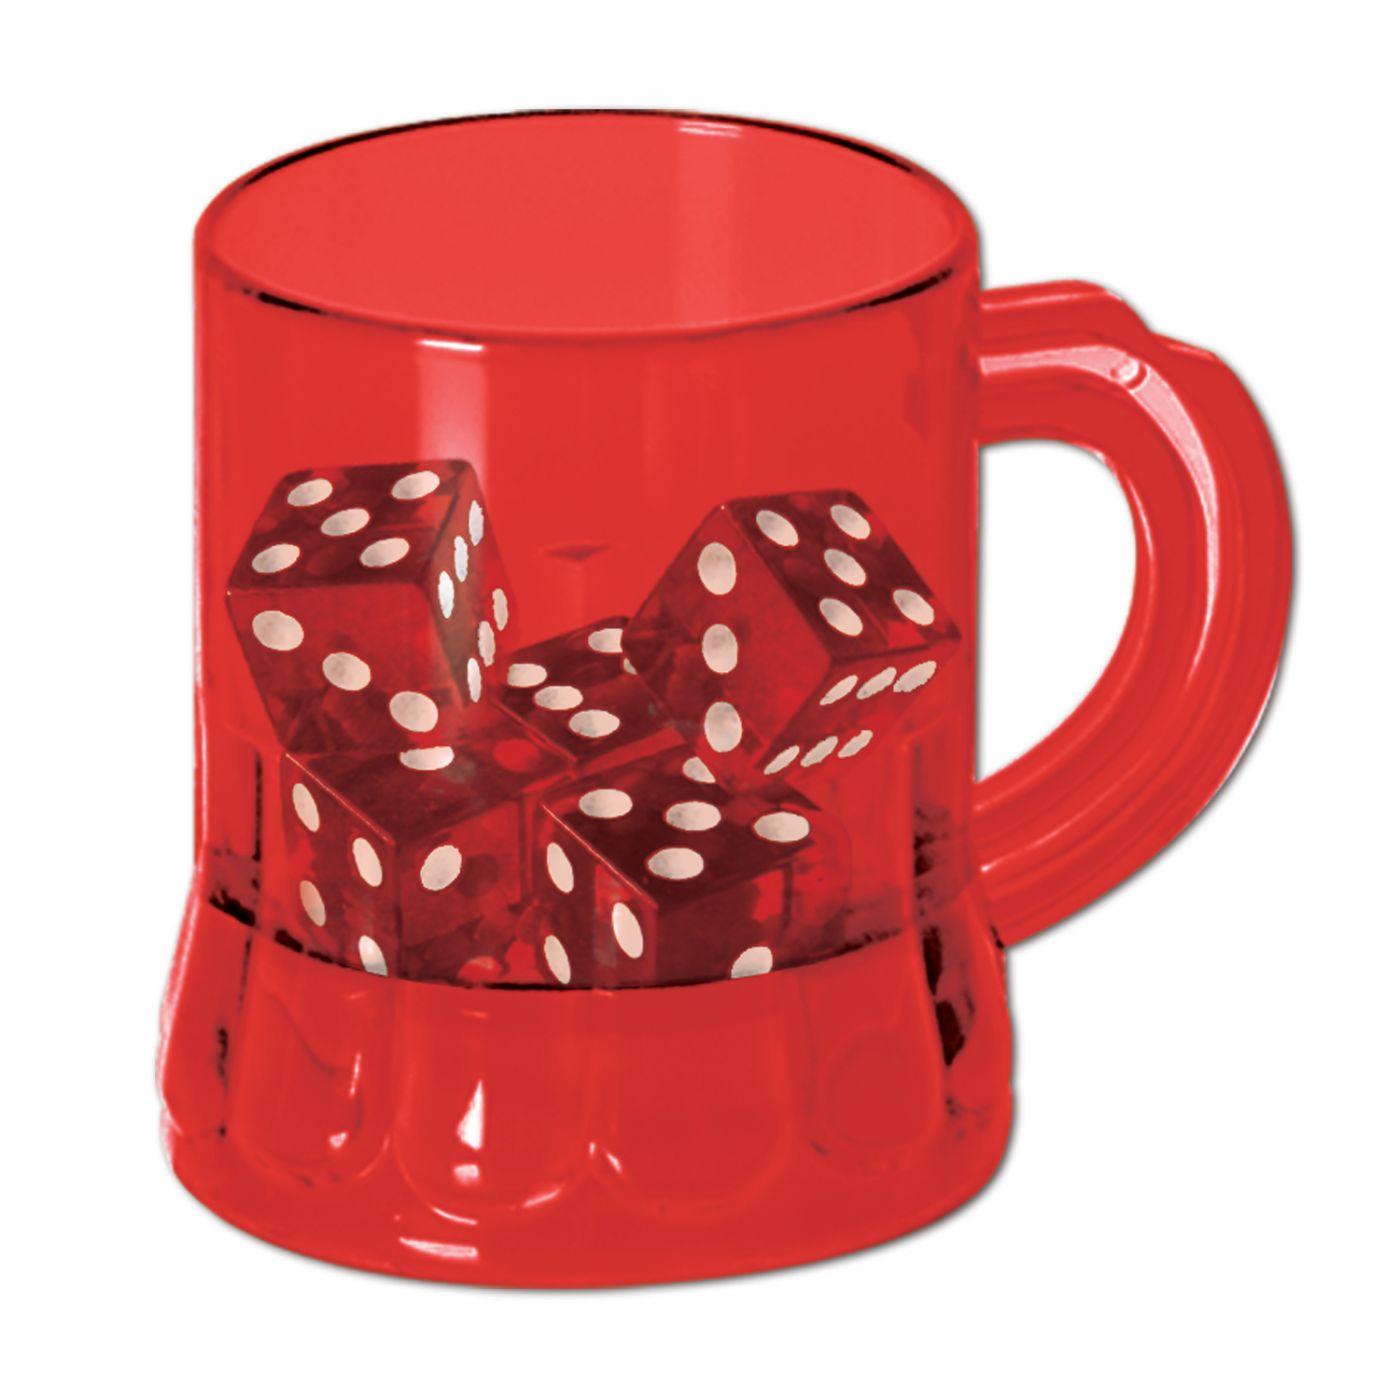 Mug Shot  w/Dice image